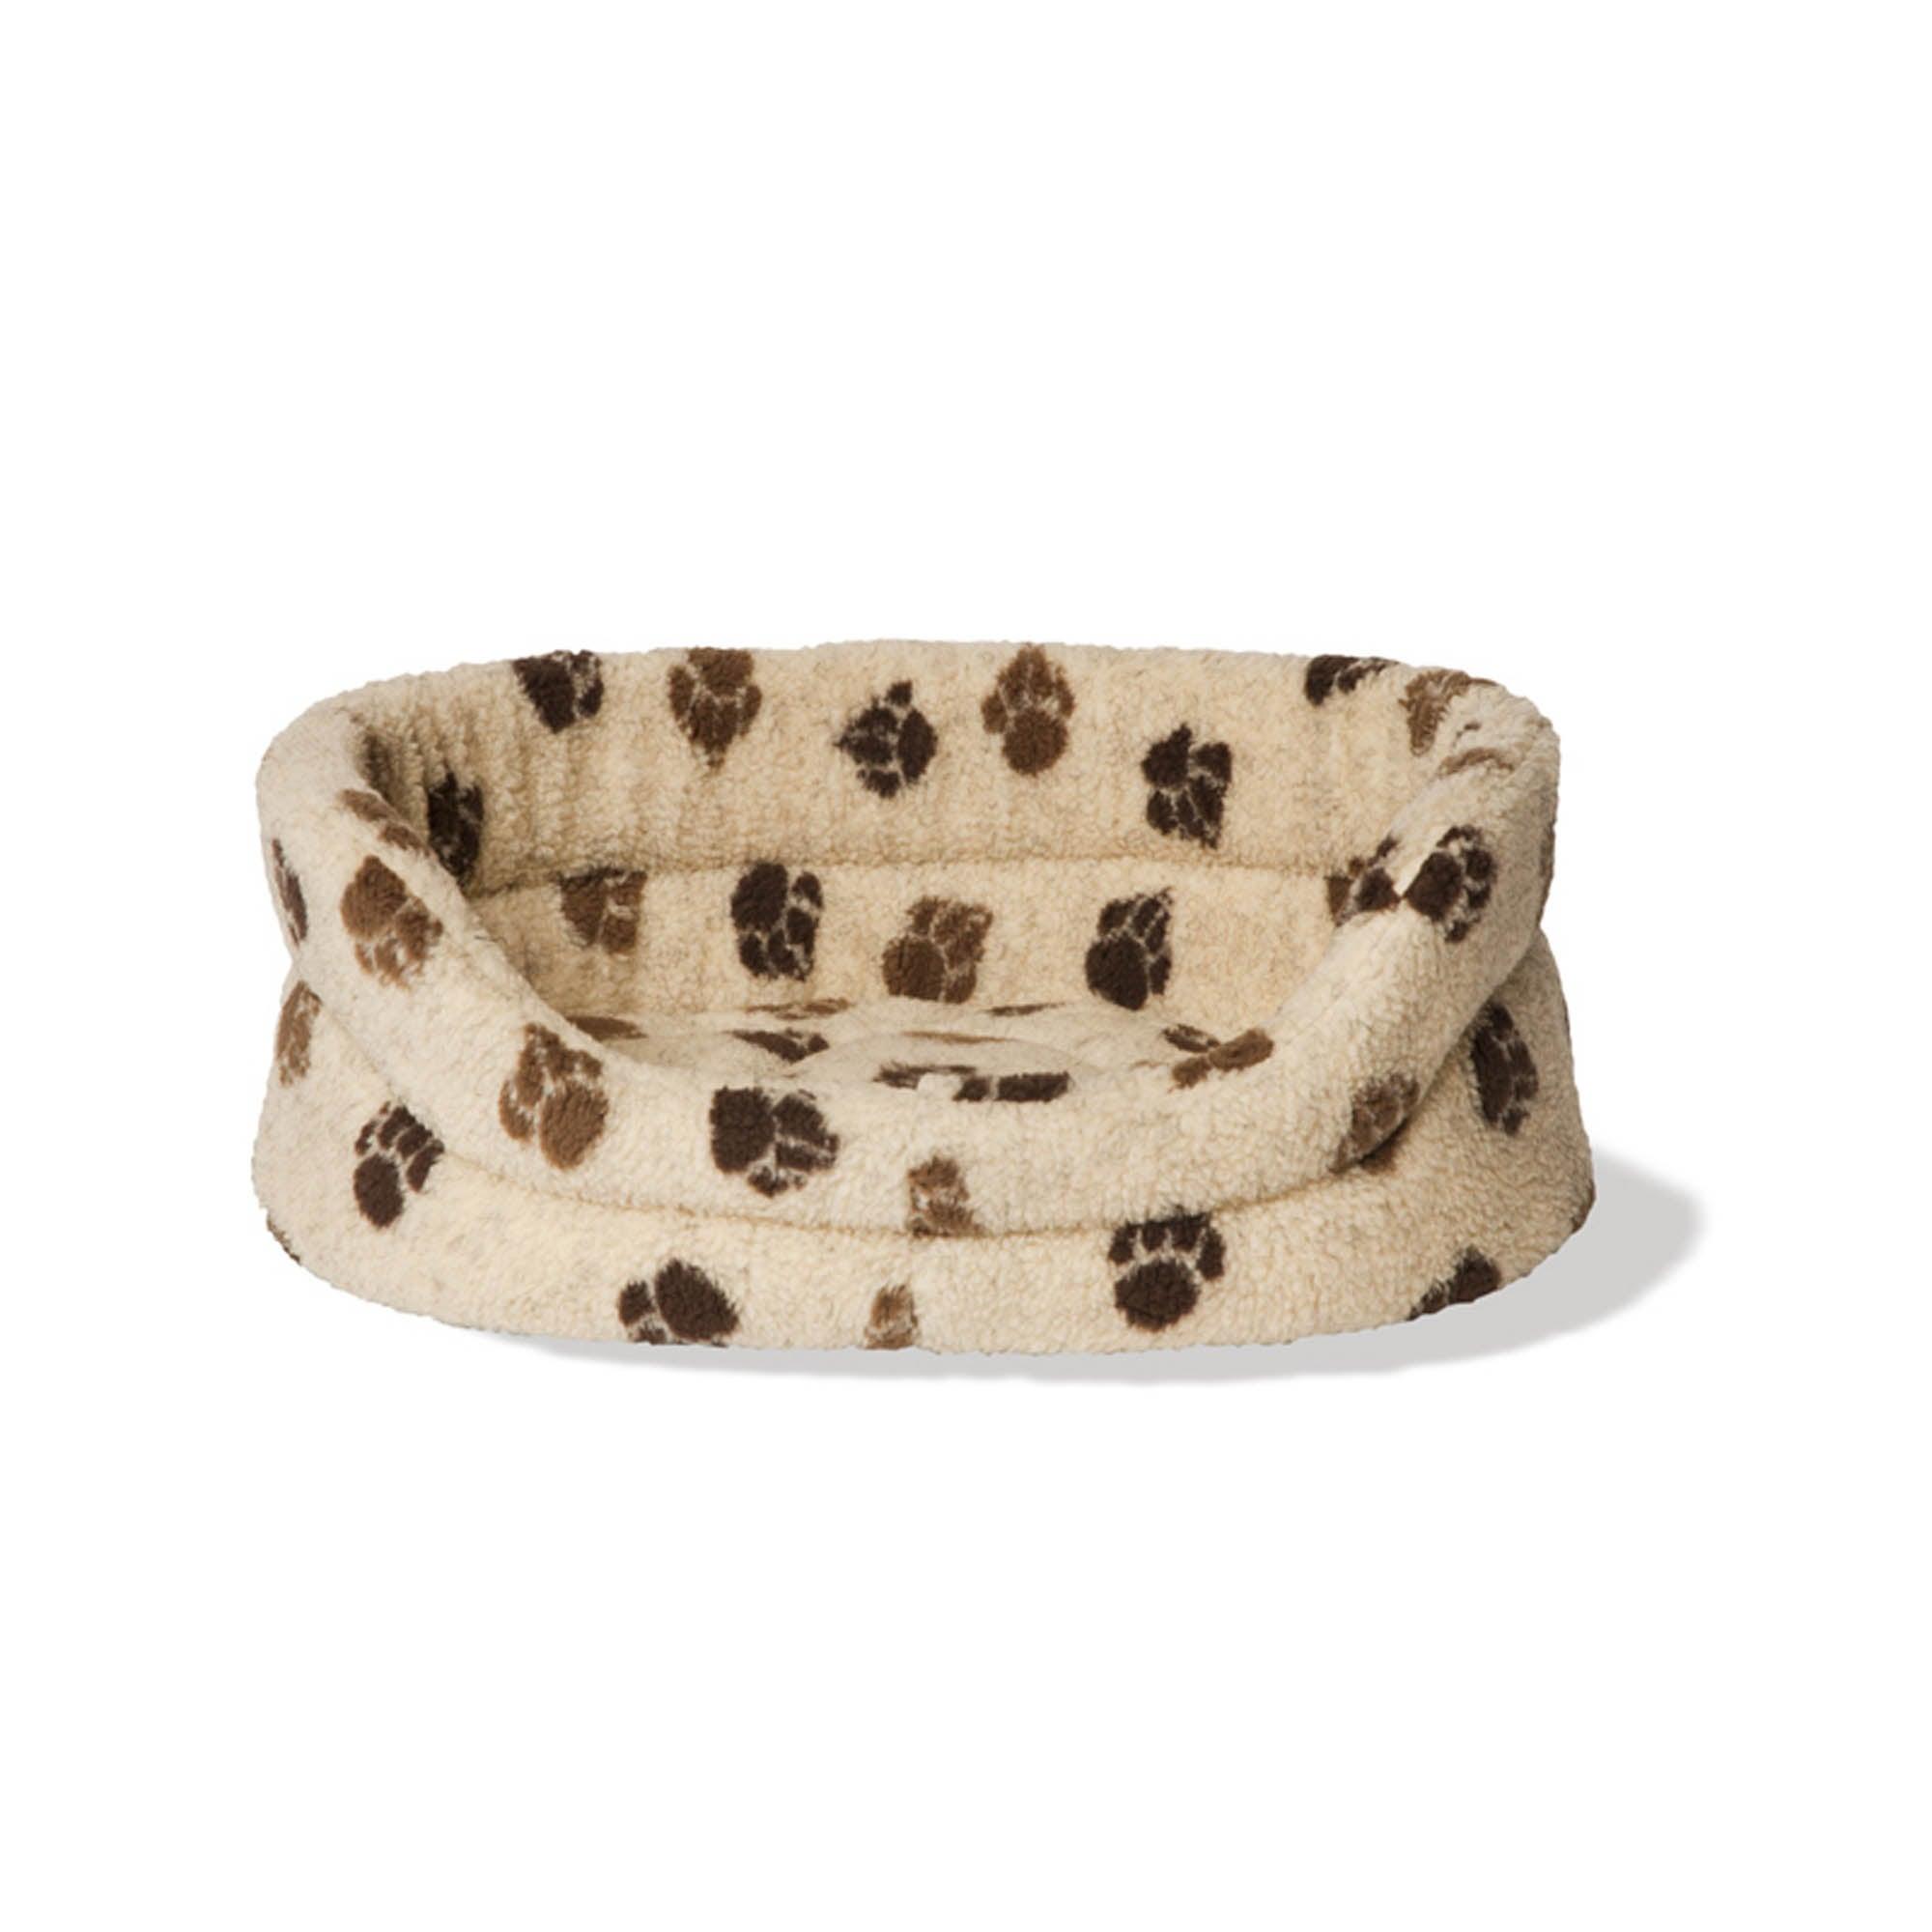 Cream Paw Print Dog Bed Cream / Brown